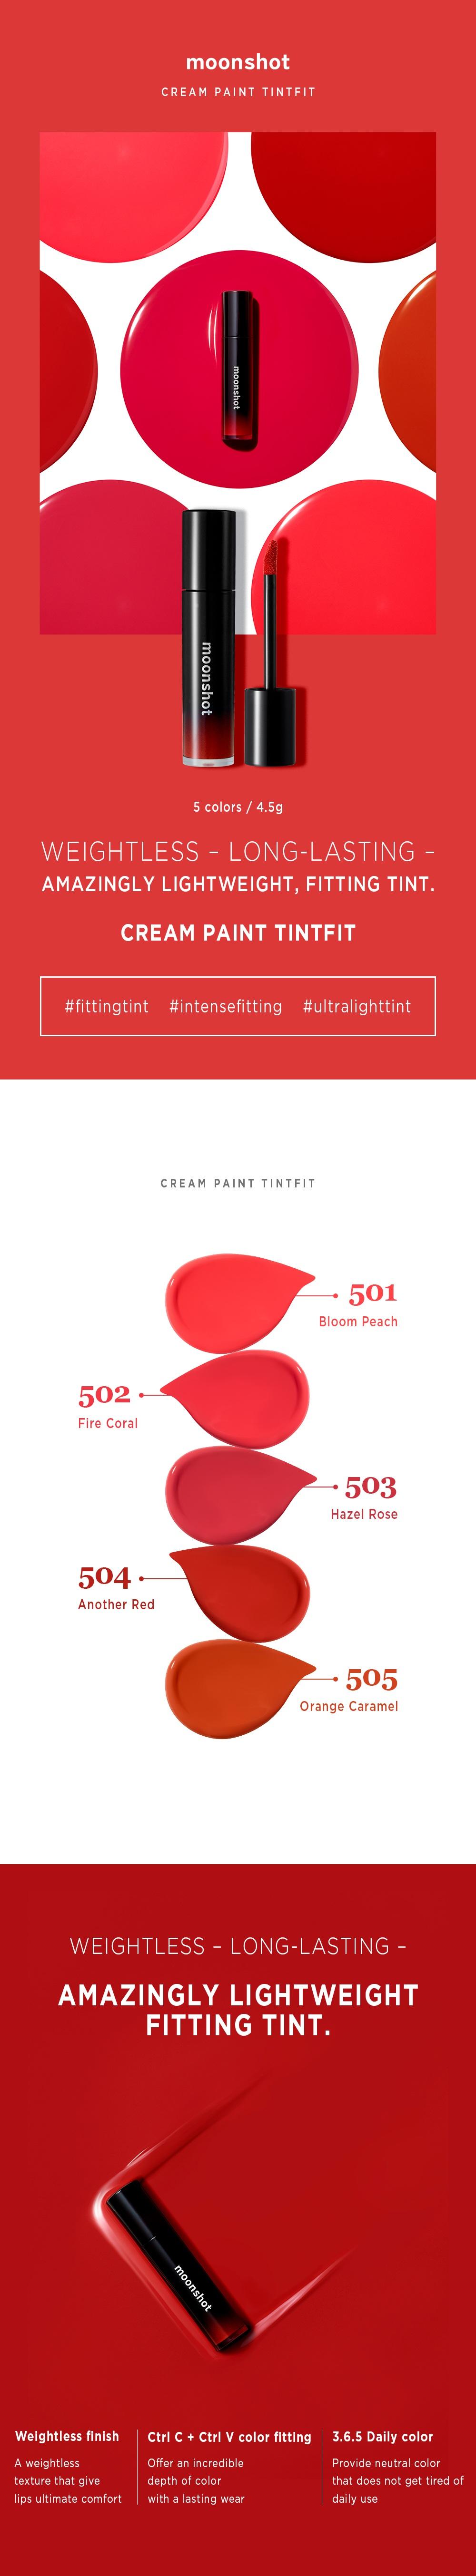 Moonshot Cream Paint Tint Fit korean makeup product online shop malaysia vietnam canada1